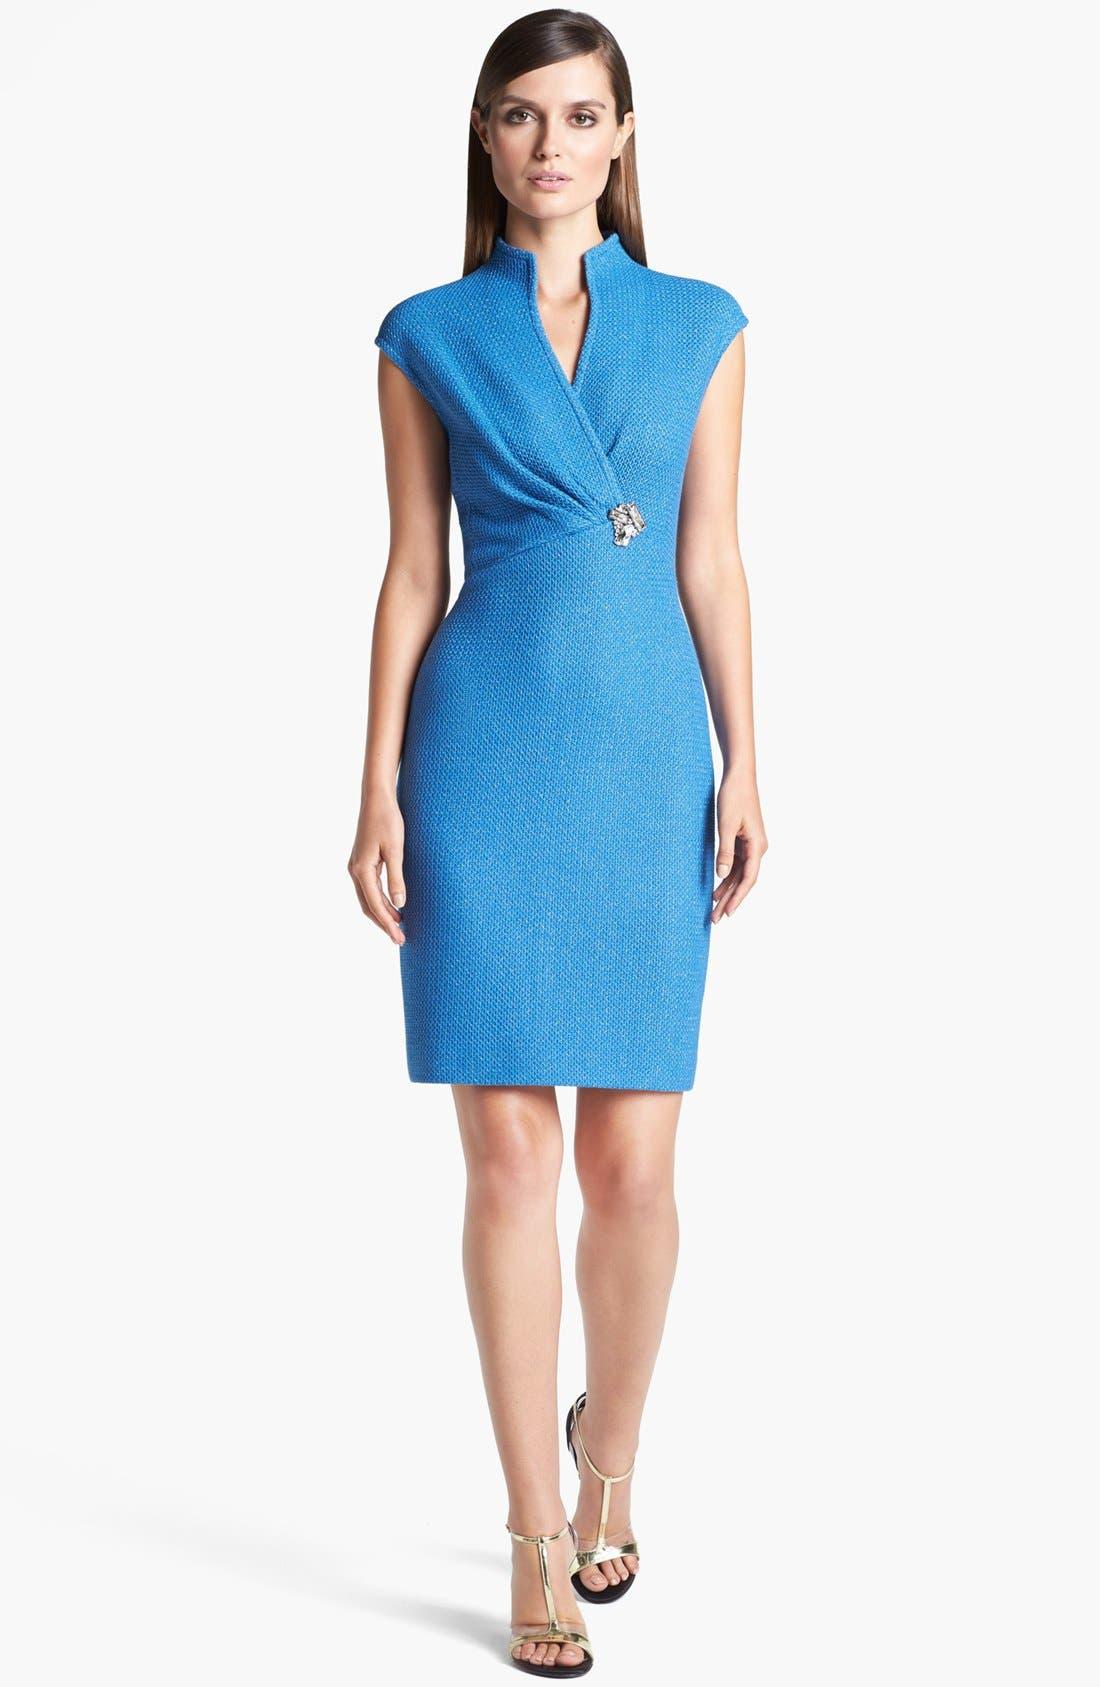 Alternate Image 1 Selected - St. John Collection Cap Sleeve Metallic Lattice Knit Dress